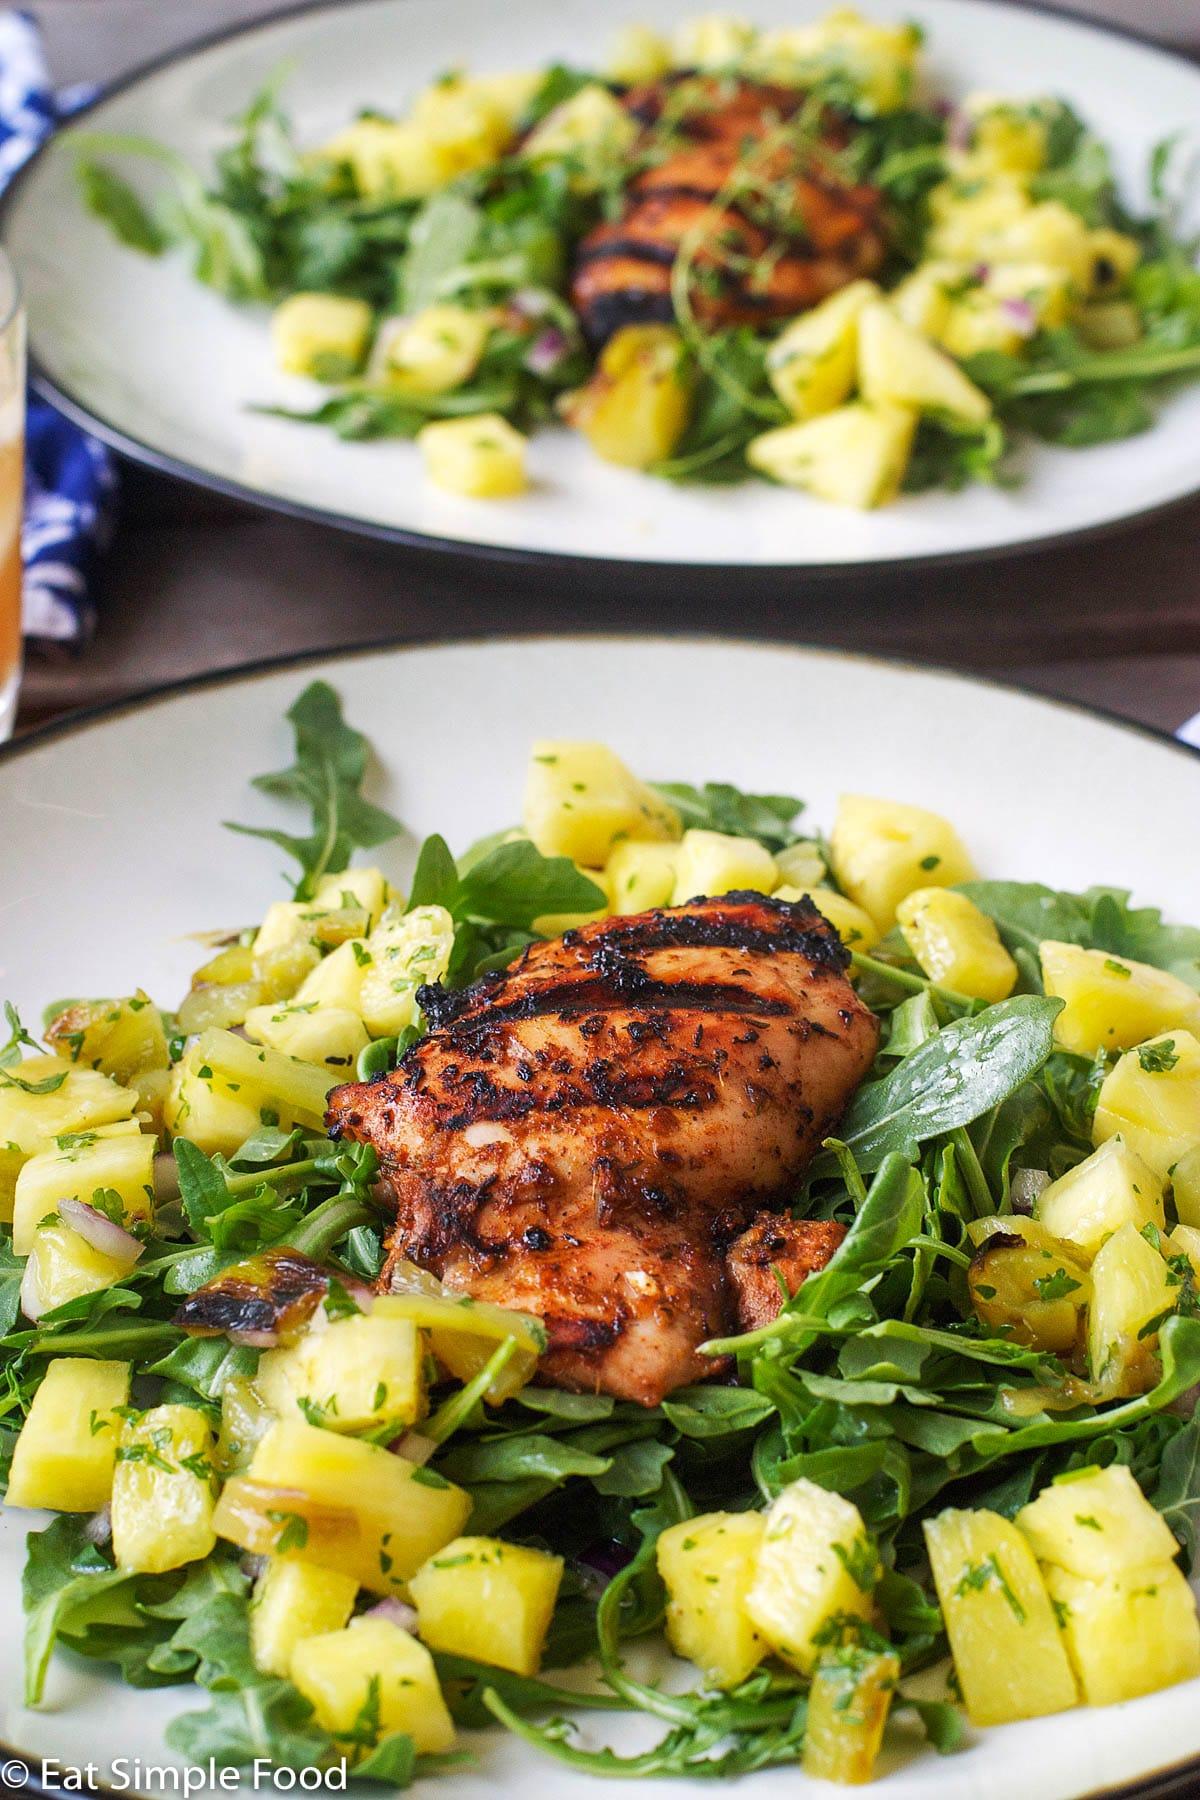 Spicy Grilled Jamaican Jerk Chicken Recipe Eat Simple Food